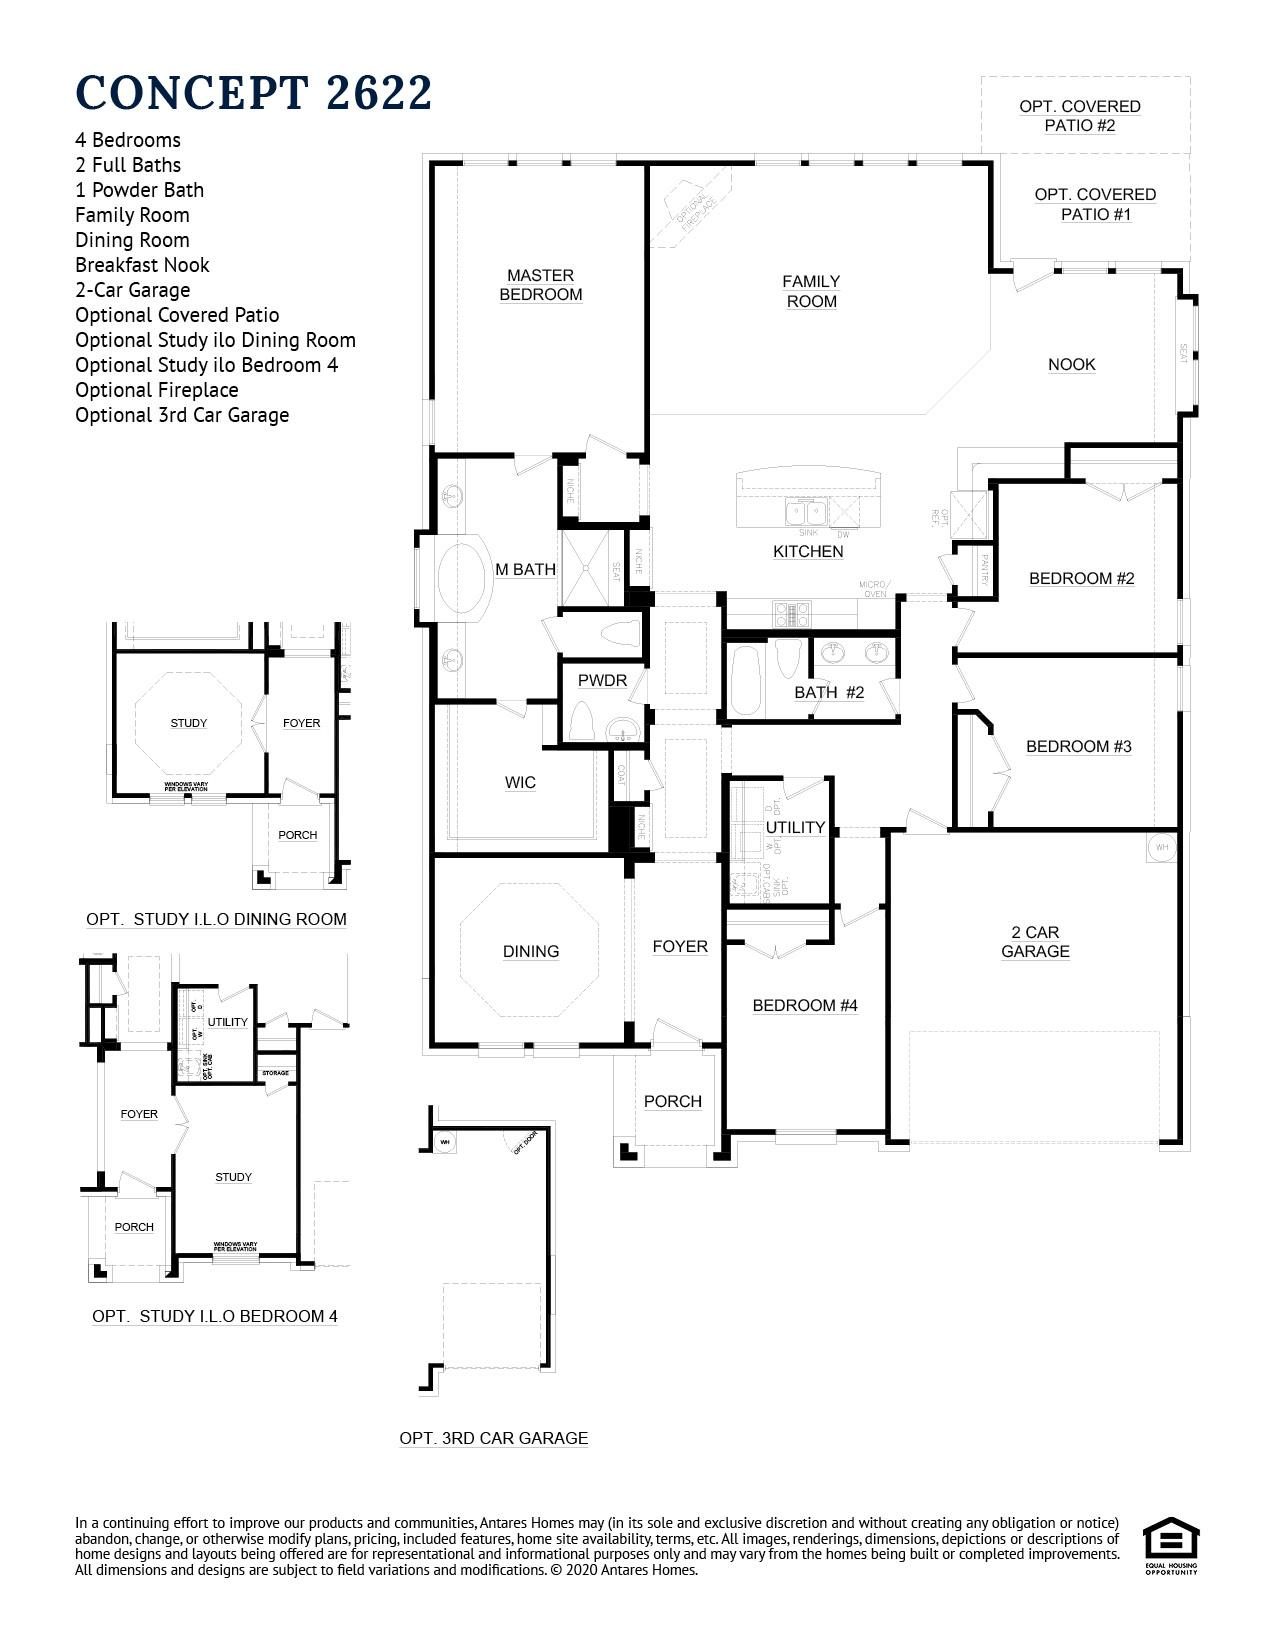 Concept 2622 Floorplan